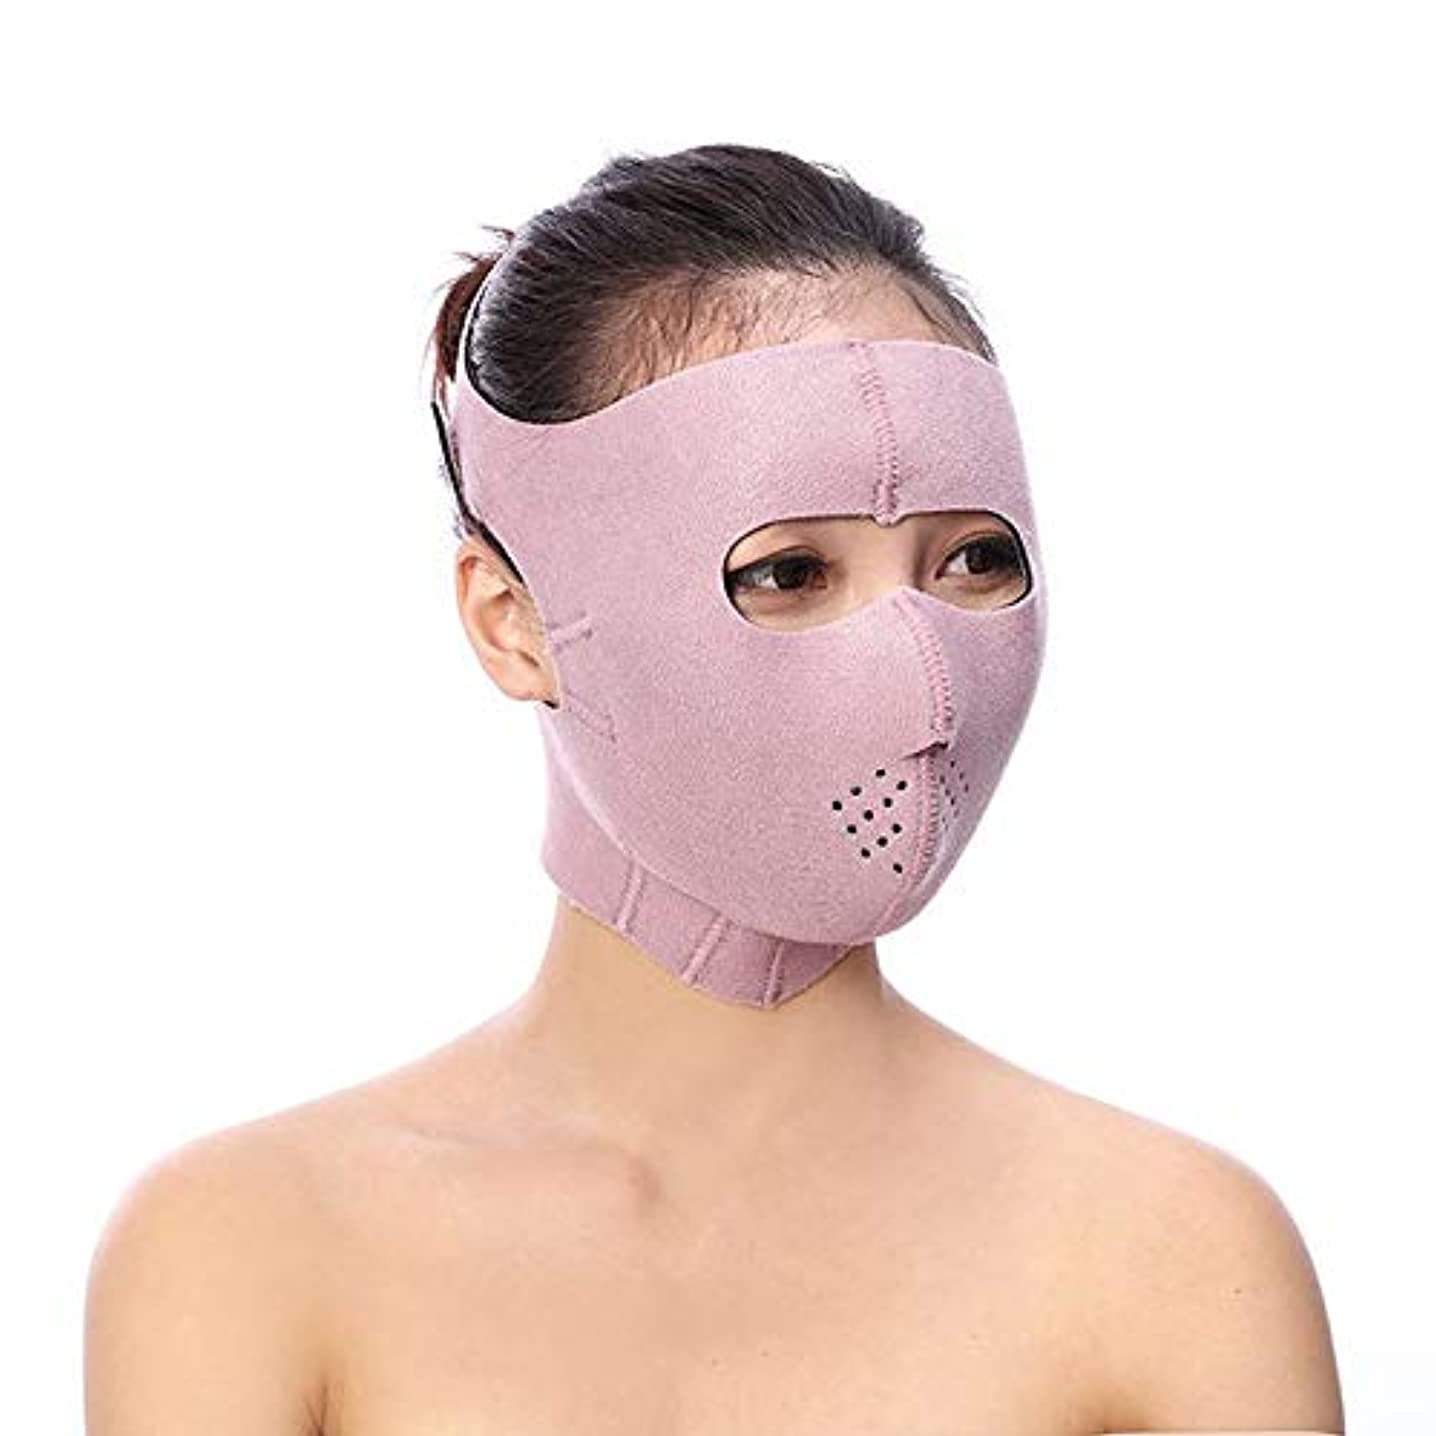 Jia Jia- フェイシャルリフティング痩身ベルト - Vフェイス包帯マスクフェイシャルマッサージャー無料の薄いフェイス包帯整形マスクを引き締める顔と首の顔スリム 顔面包帯